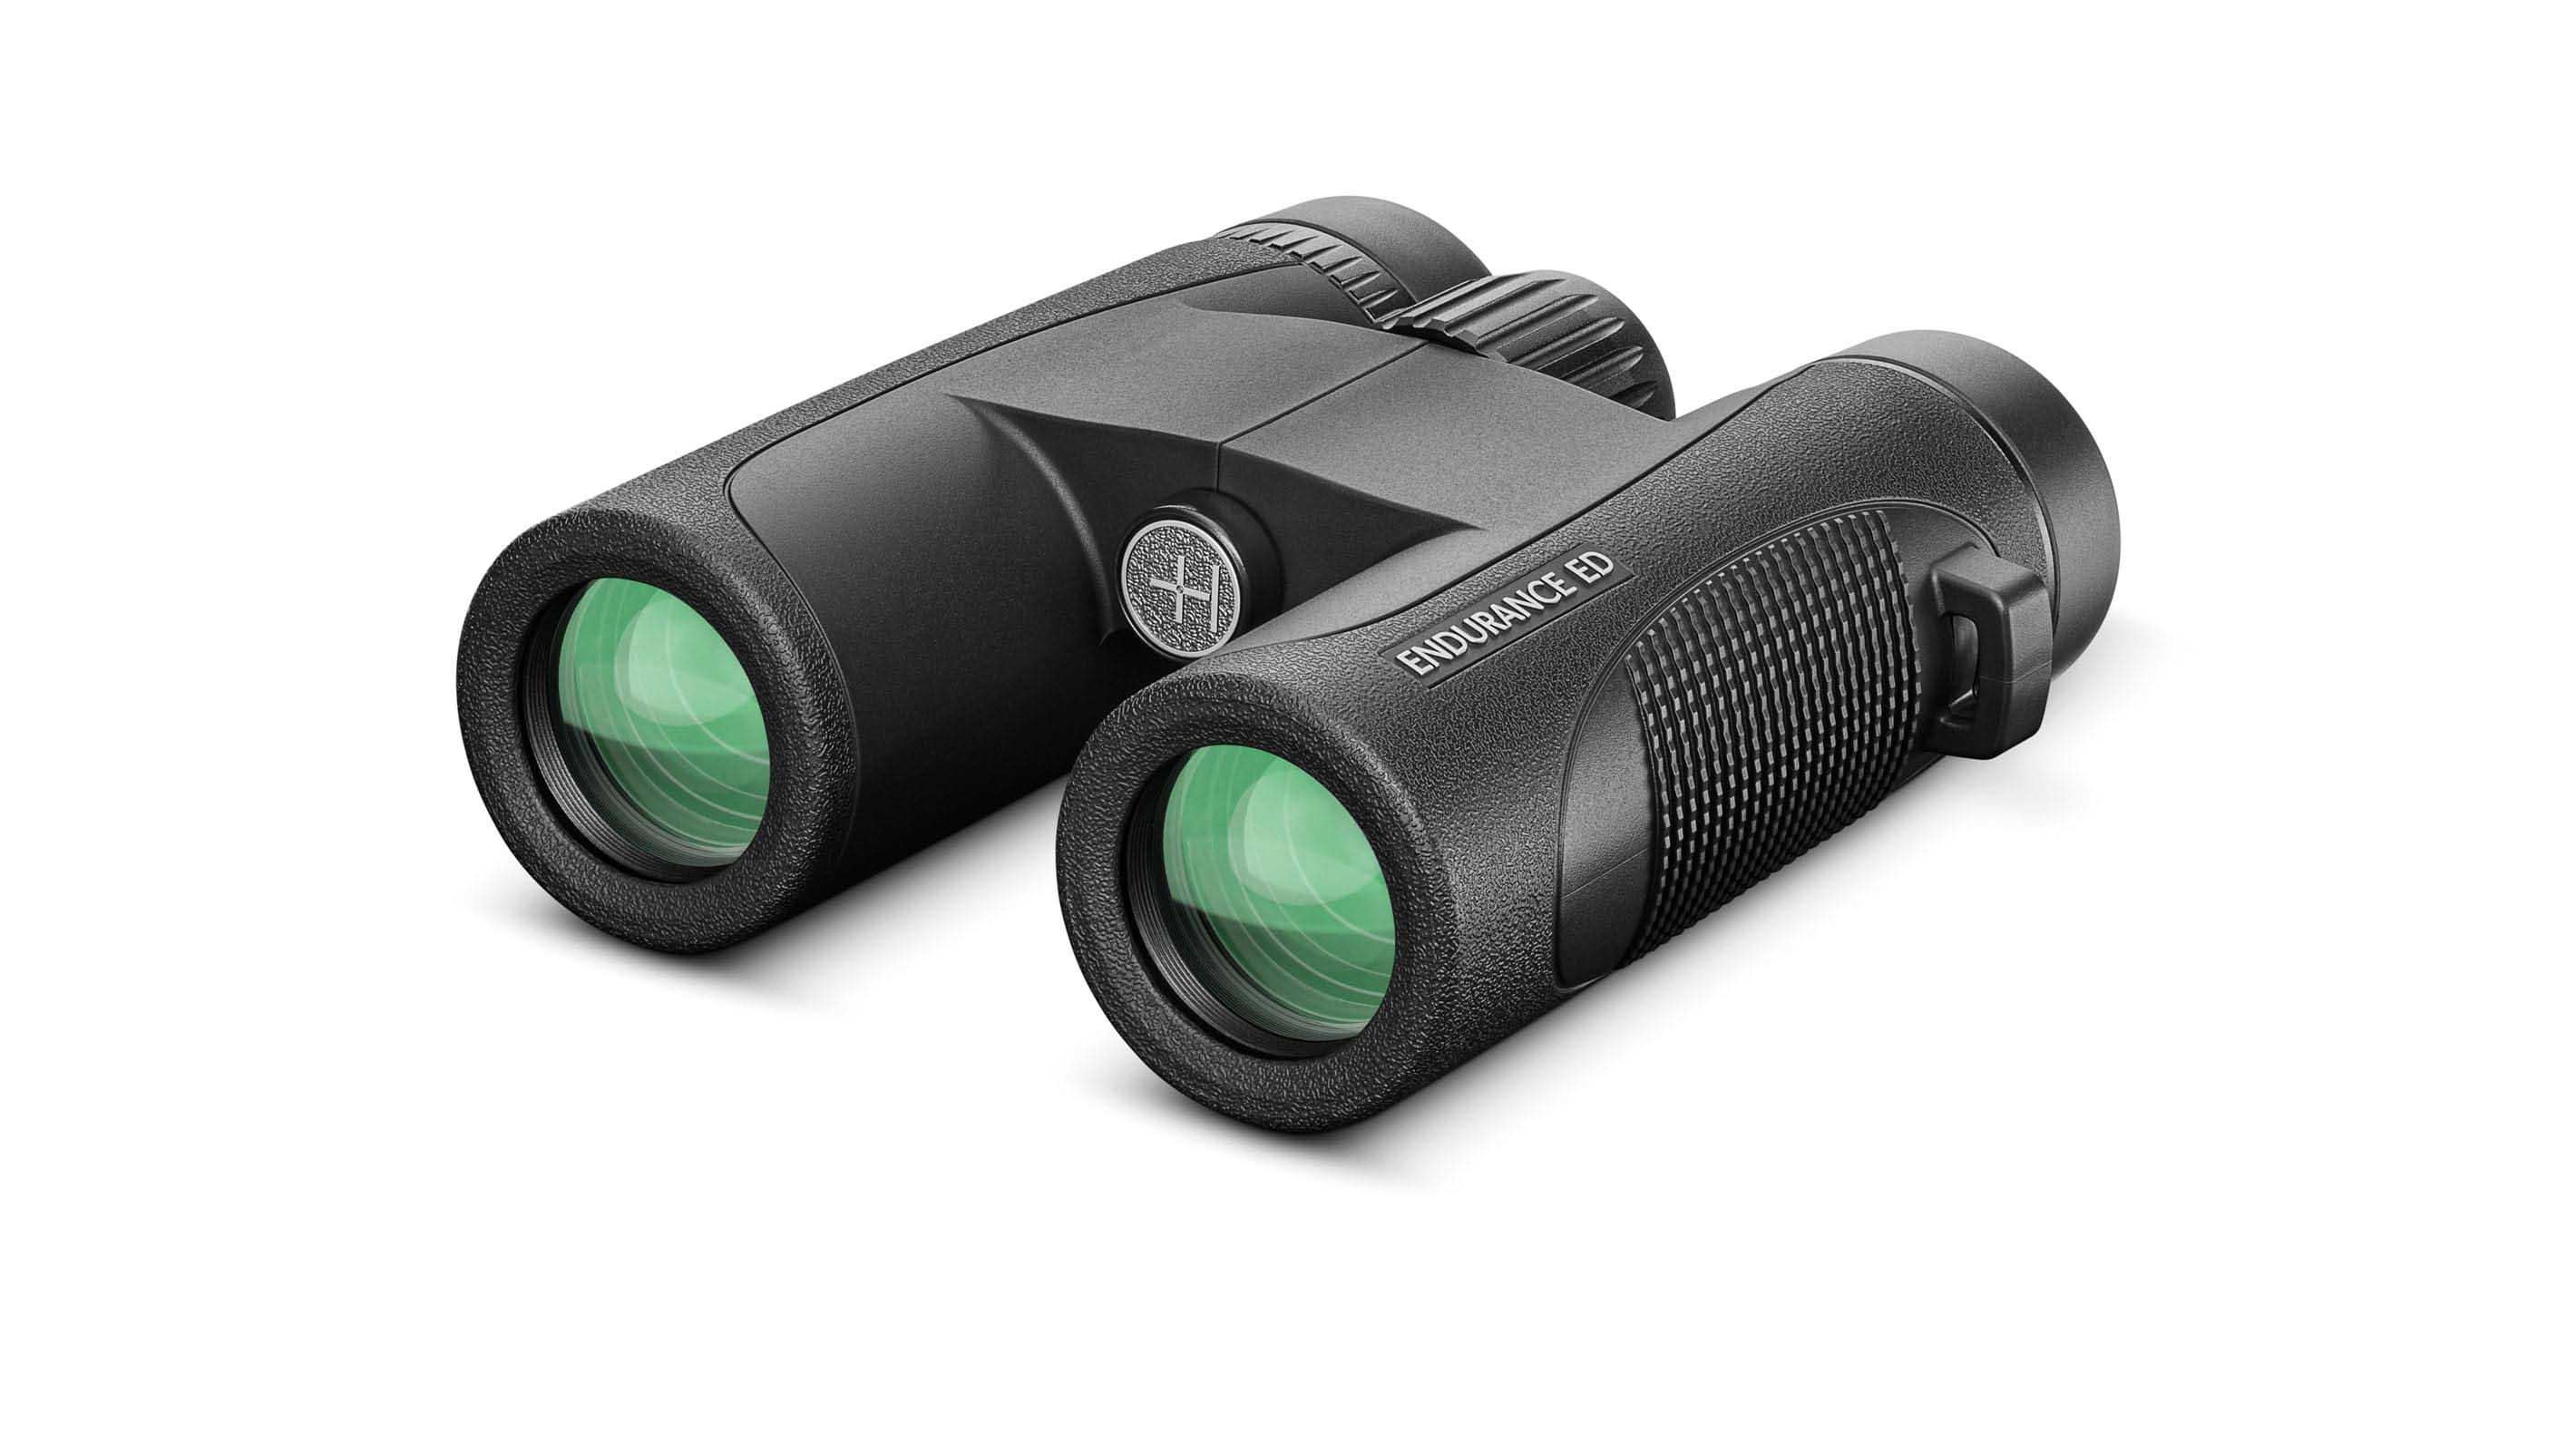 Hawke Endurance ED 8x32 Binoculars